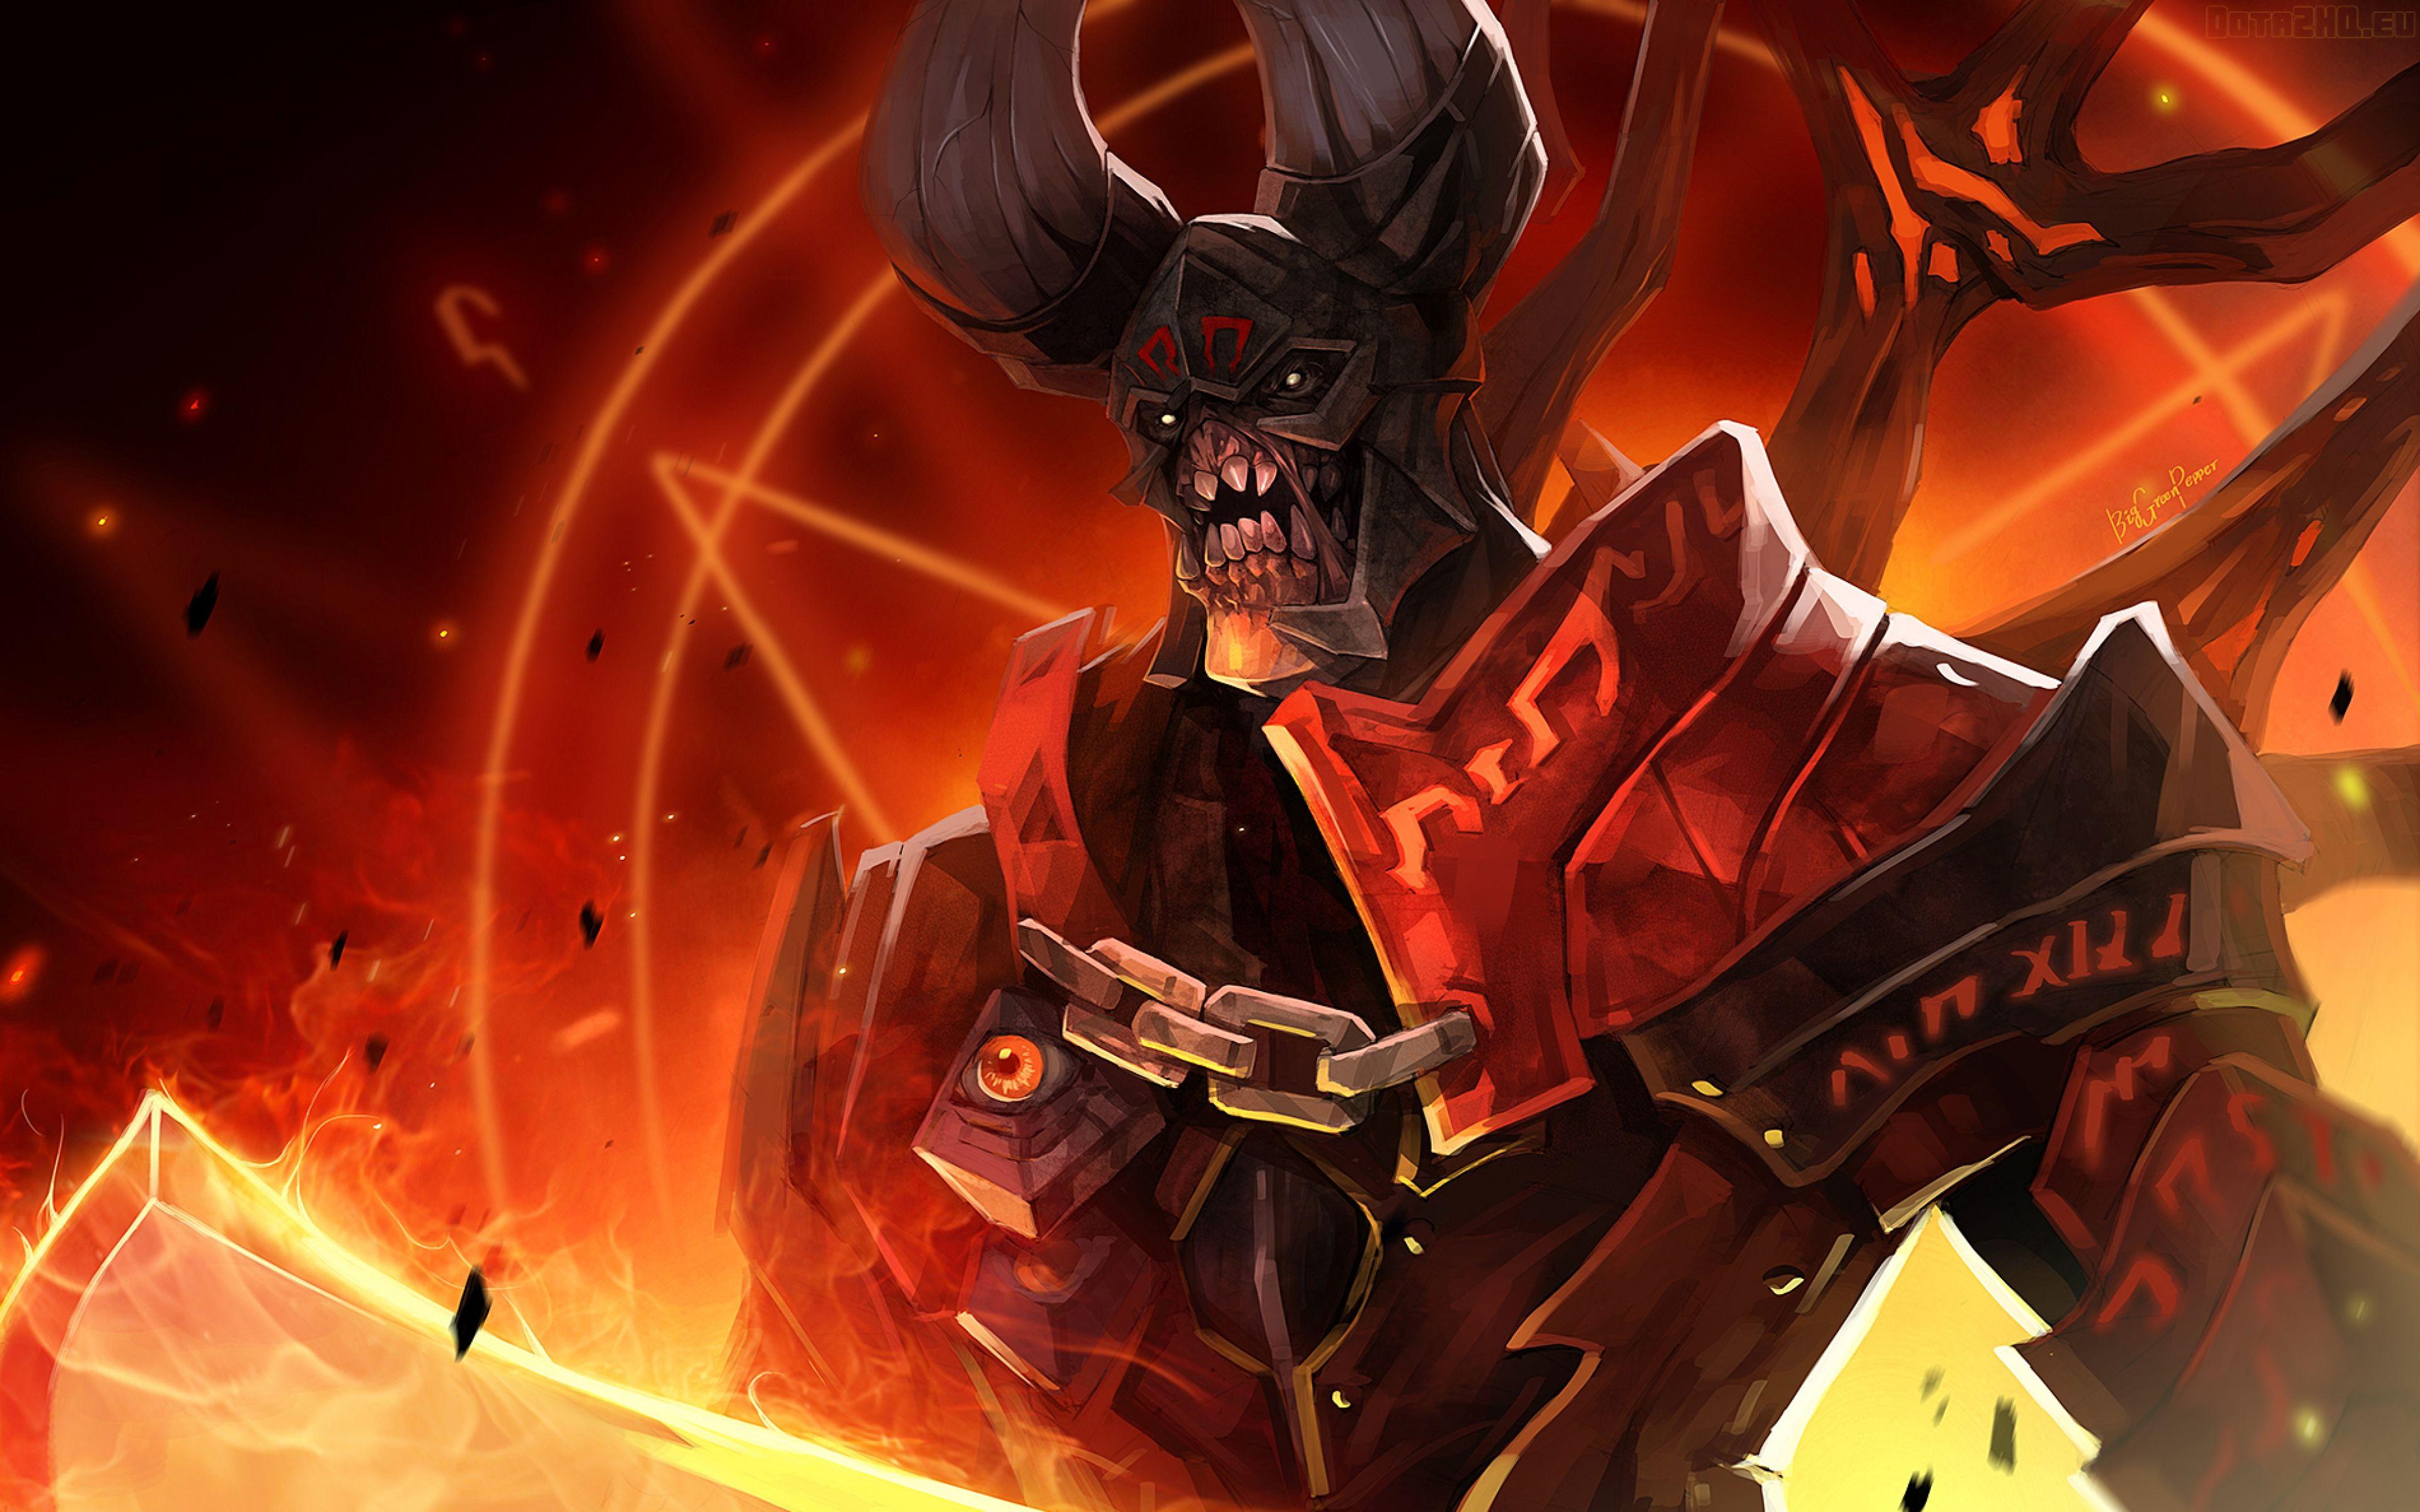 Steam Community Guide Kak Ustanovit Brutal Doom Dlya Dota 2 Wallpaper Defense Of The Ancients Dota 2